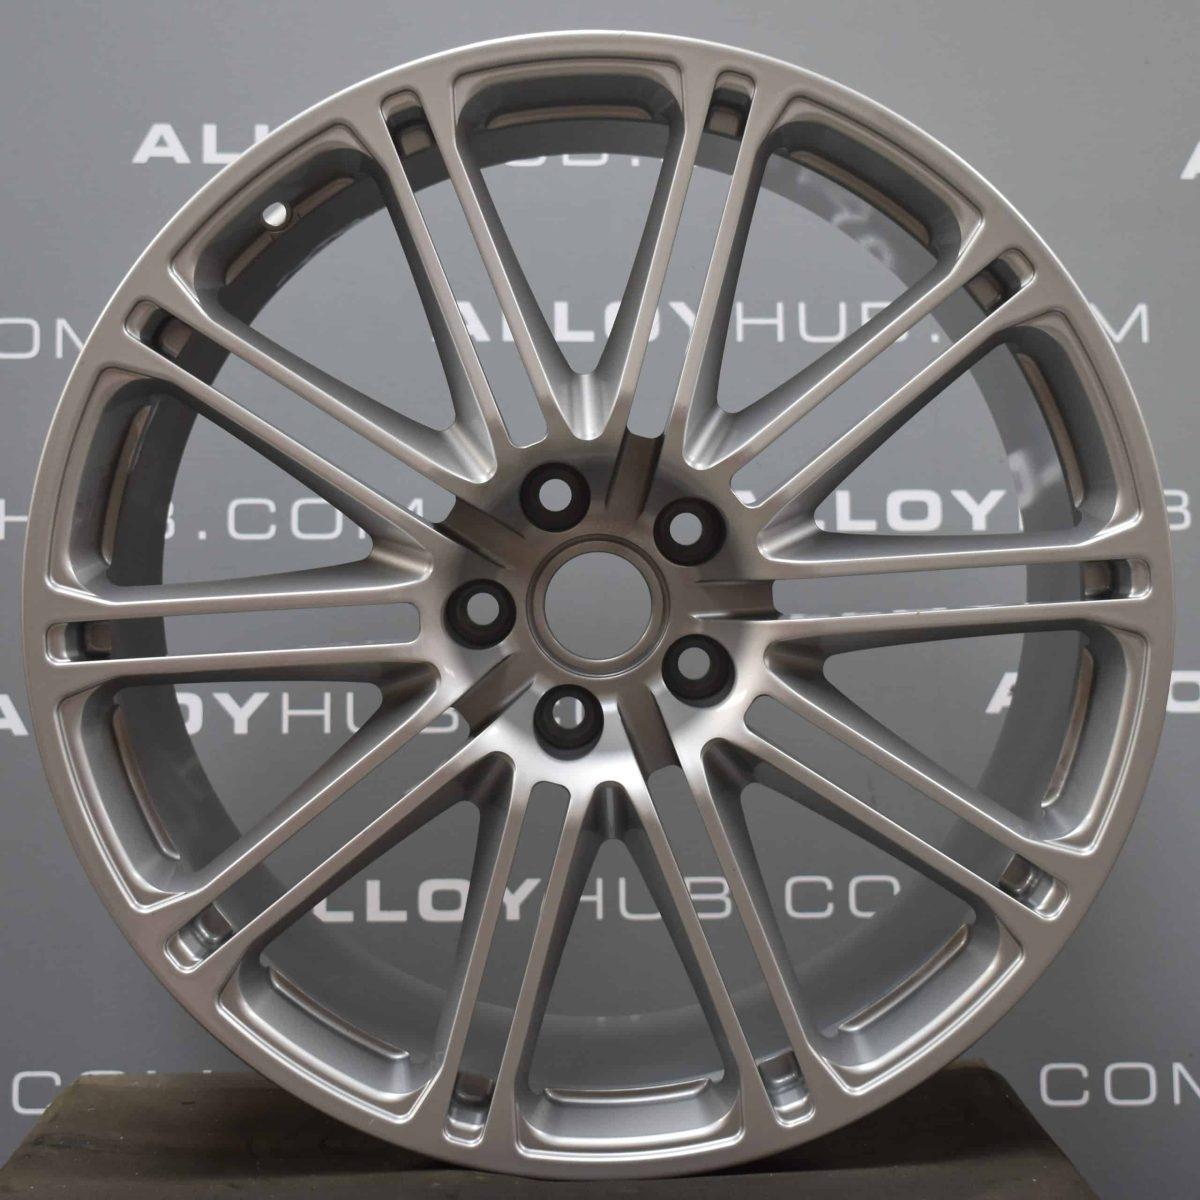 "Genuine Aston Martin DBS DB9 Speedline 10 Double Spoke 20"" Inch Alloy Wheels with Silver Finish 8D33-1007-A, 8D33-1007-B"